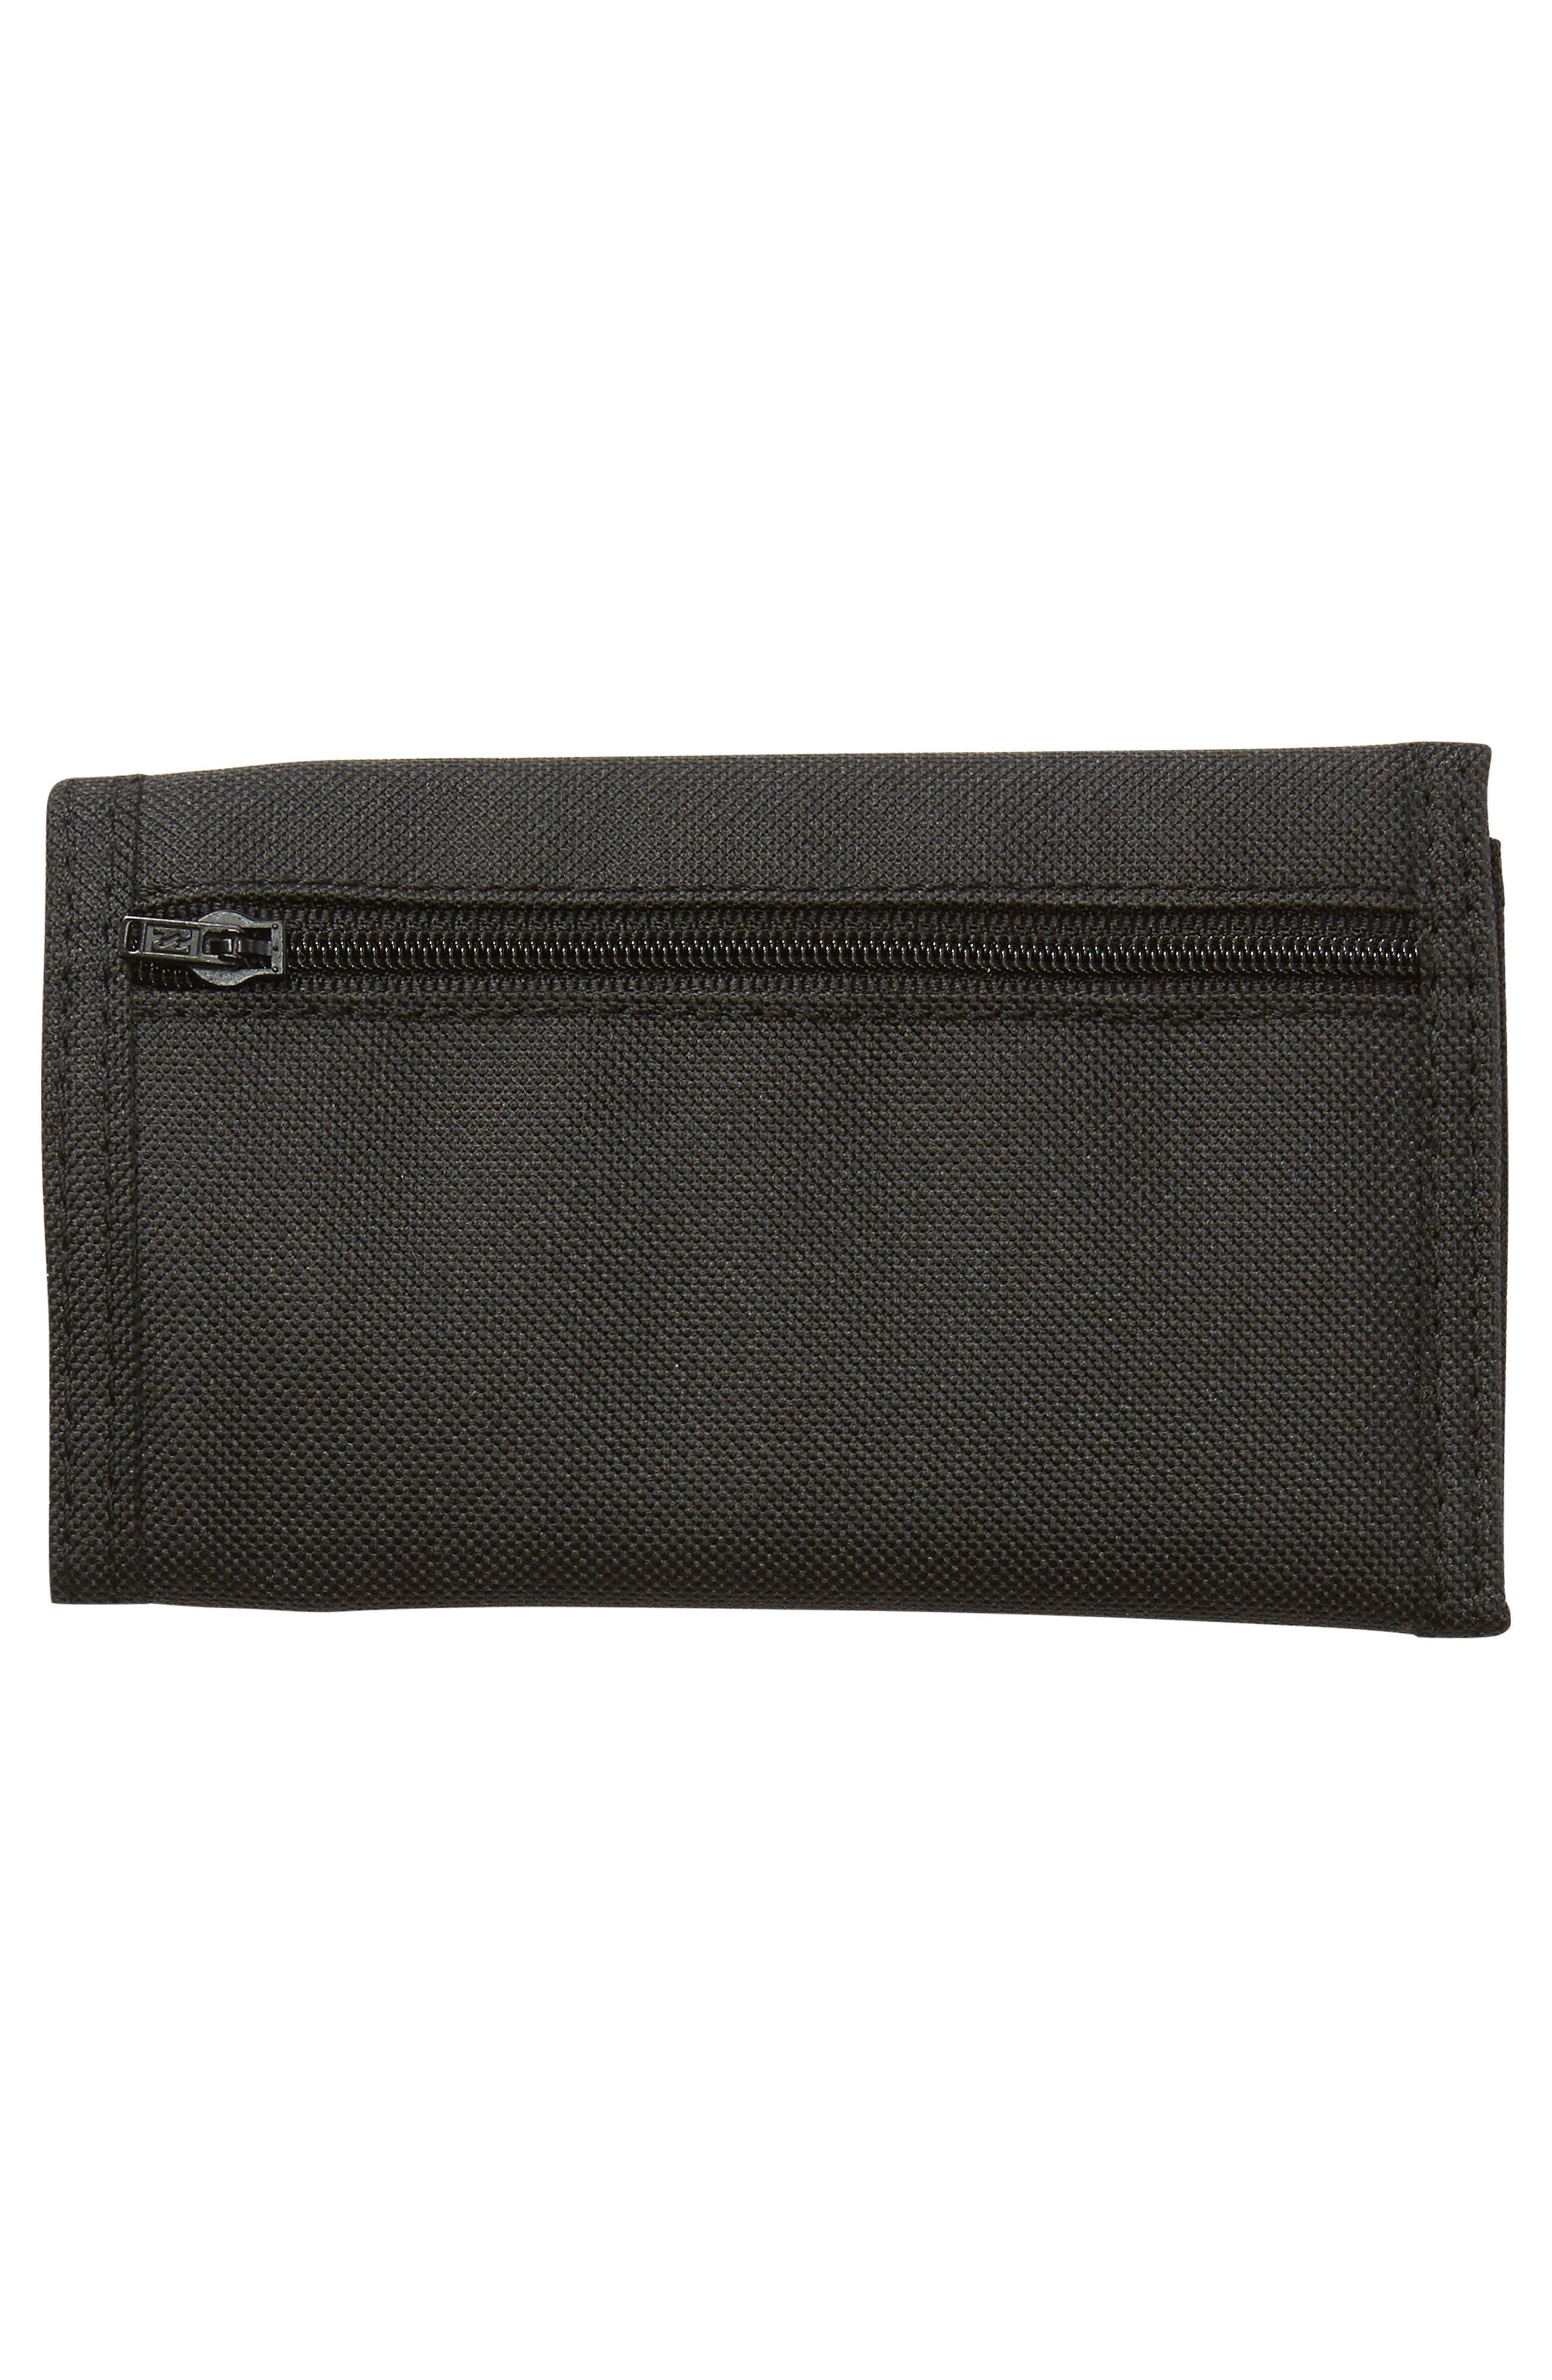 Atom Wallet,                             Alternate thumbnail 3, color,                             017